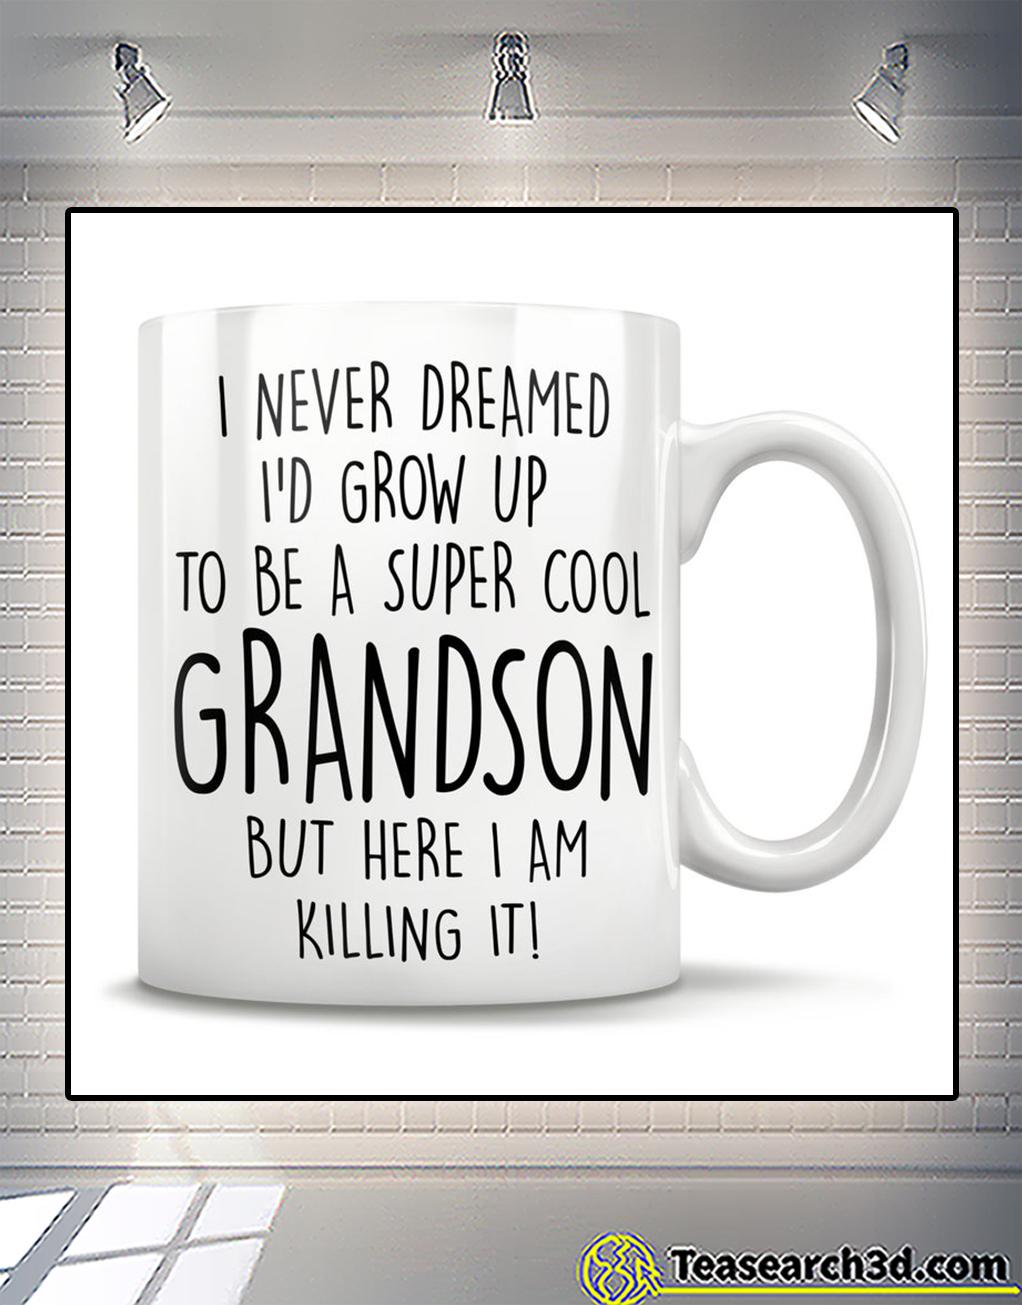 I never dreamed I'd grow up to be a super cool grandson mug